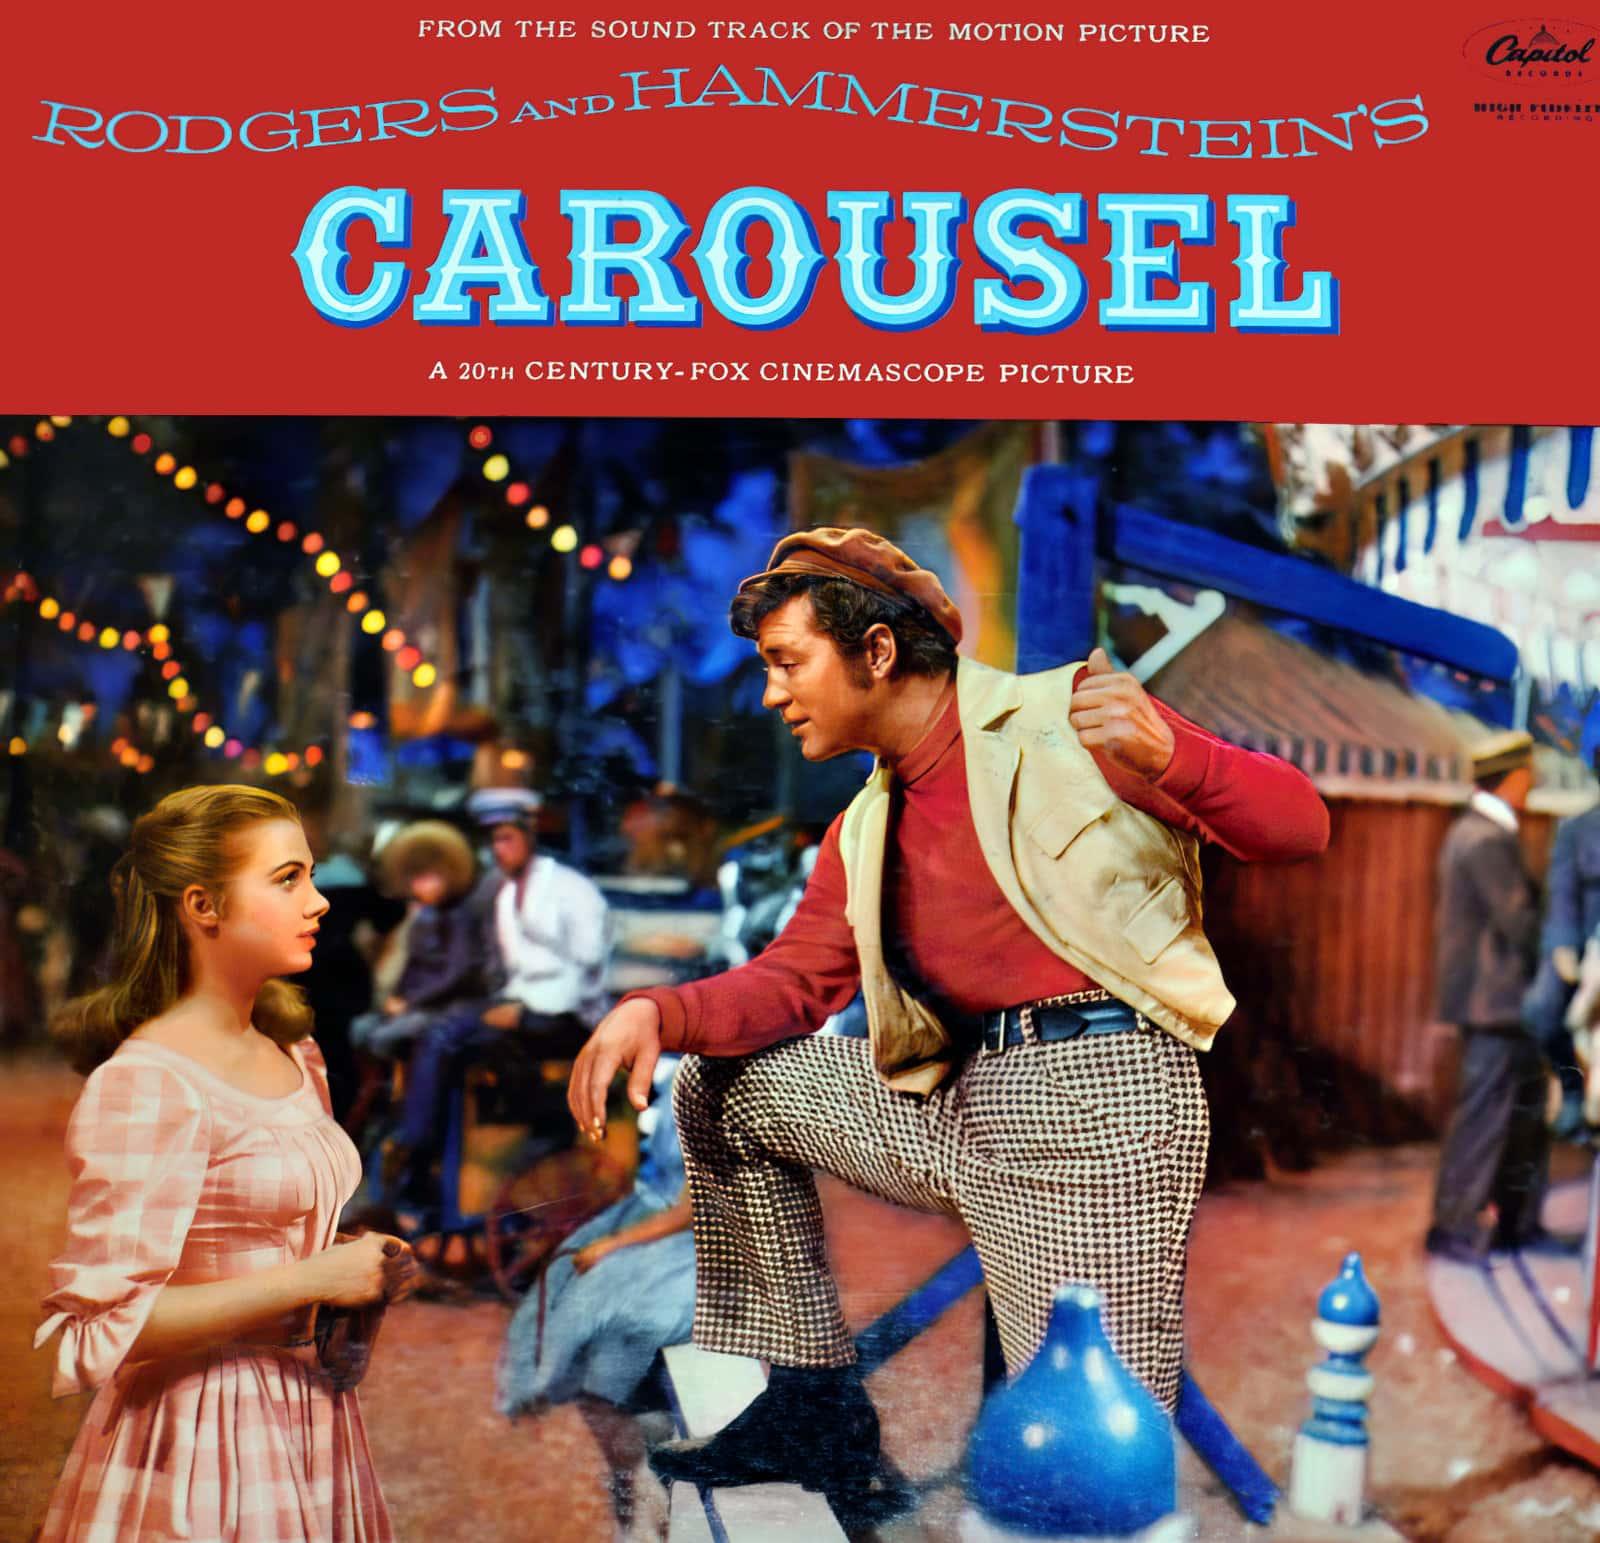 Vintage Carousel movie soundtrack cover (1950s)